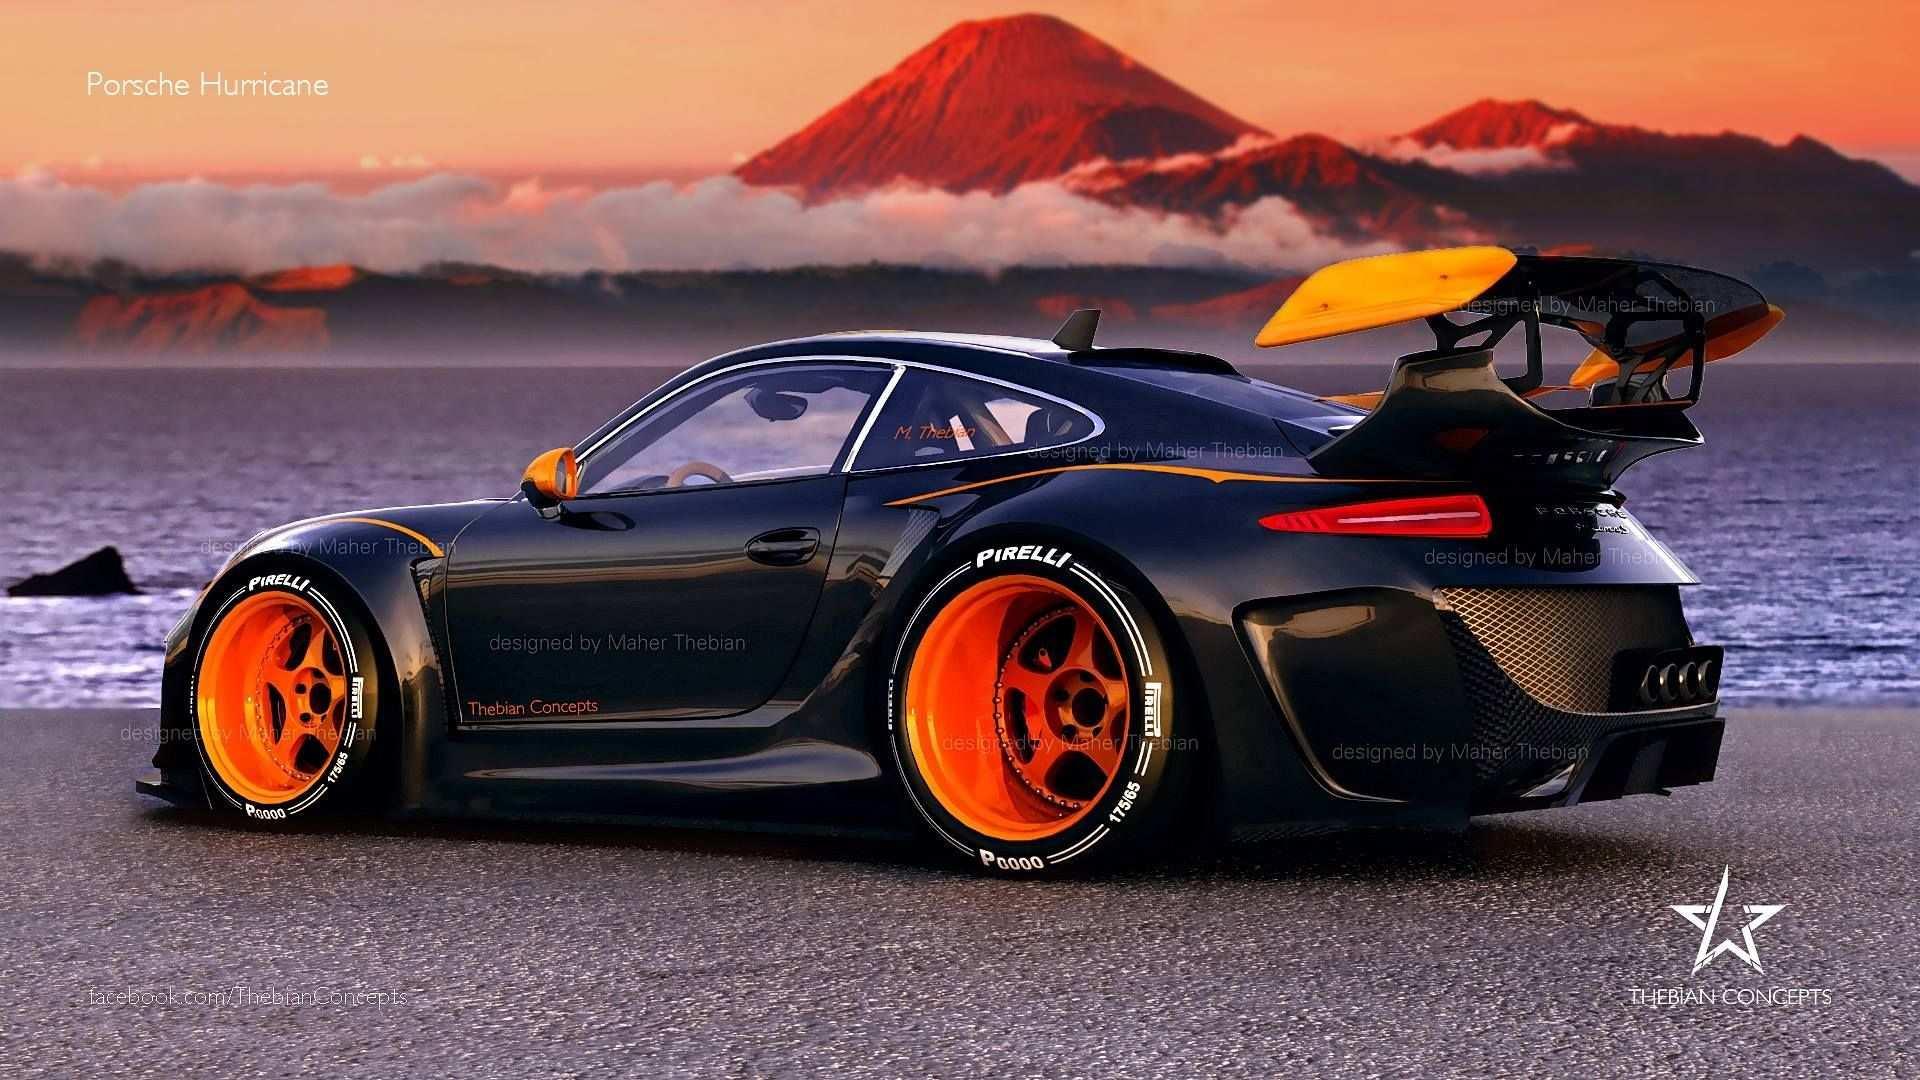 39 All New Porsche Concept 2020 Overview by Porsche Concept 2020